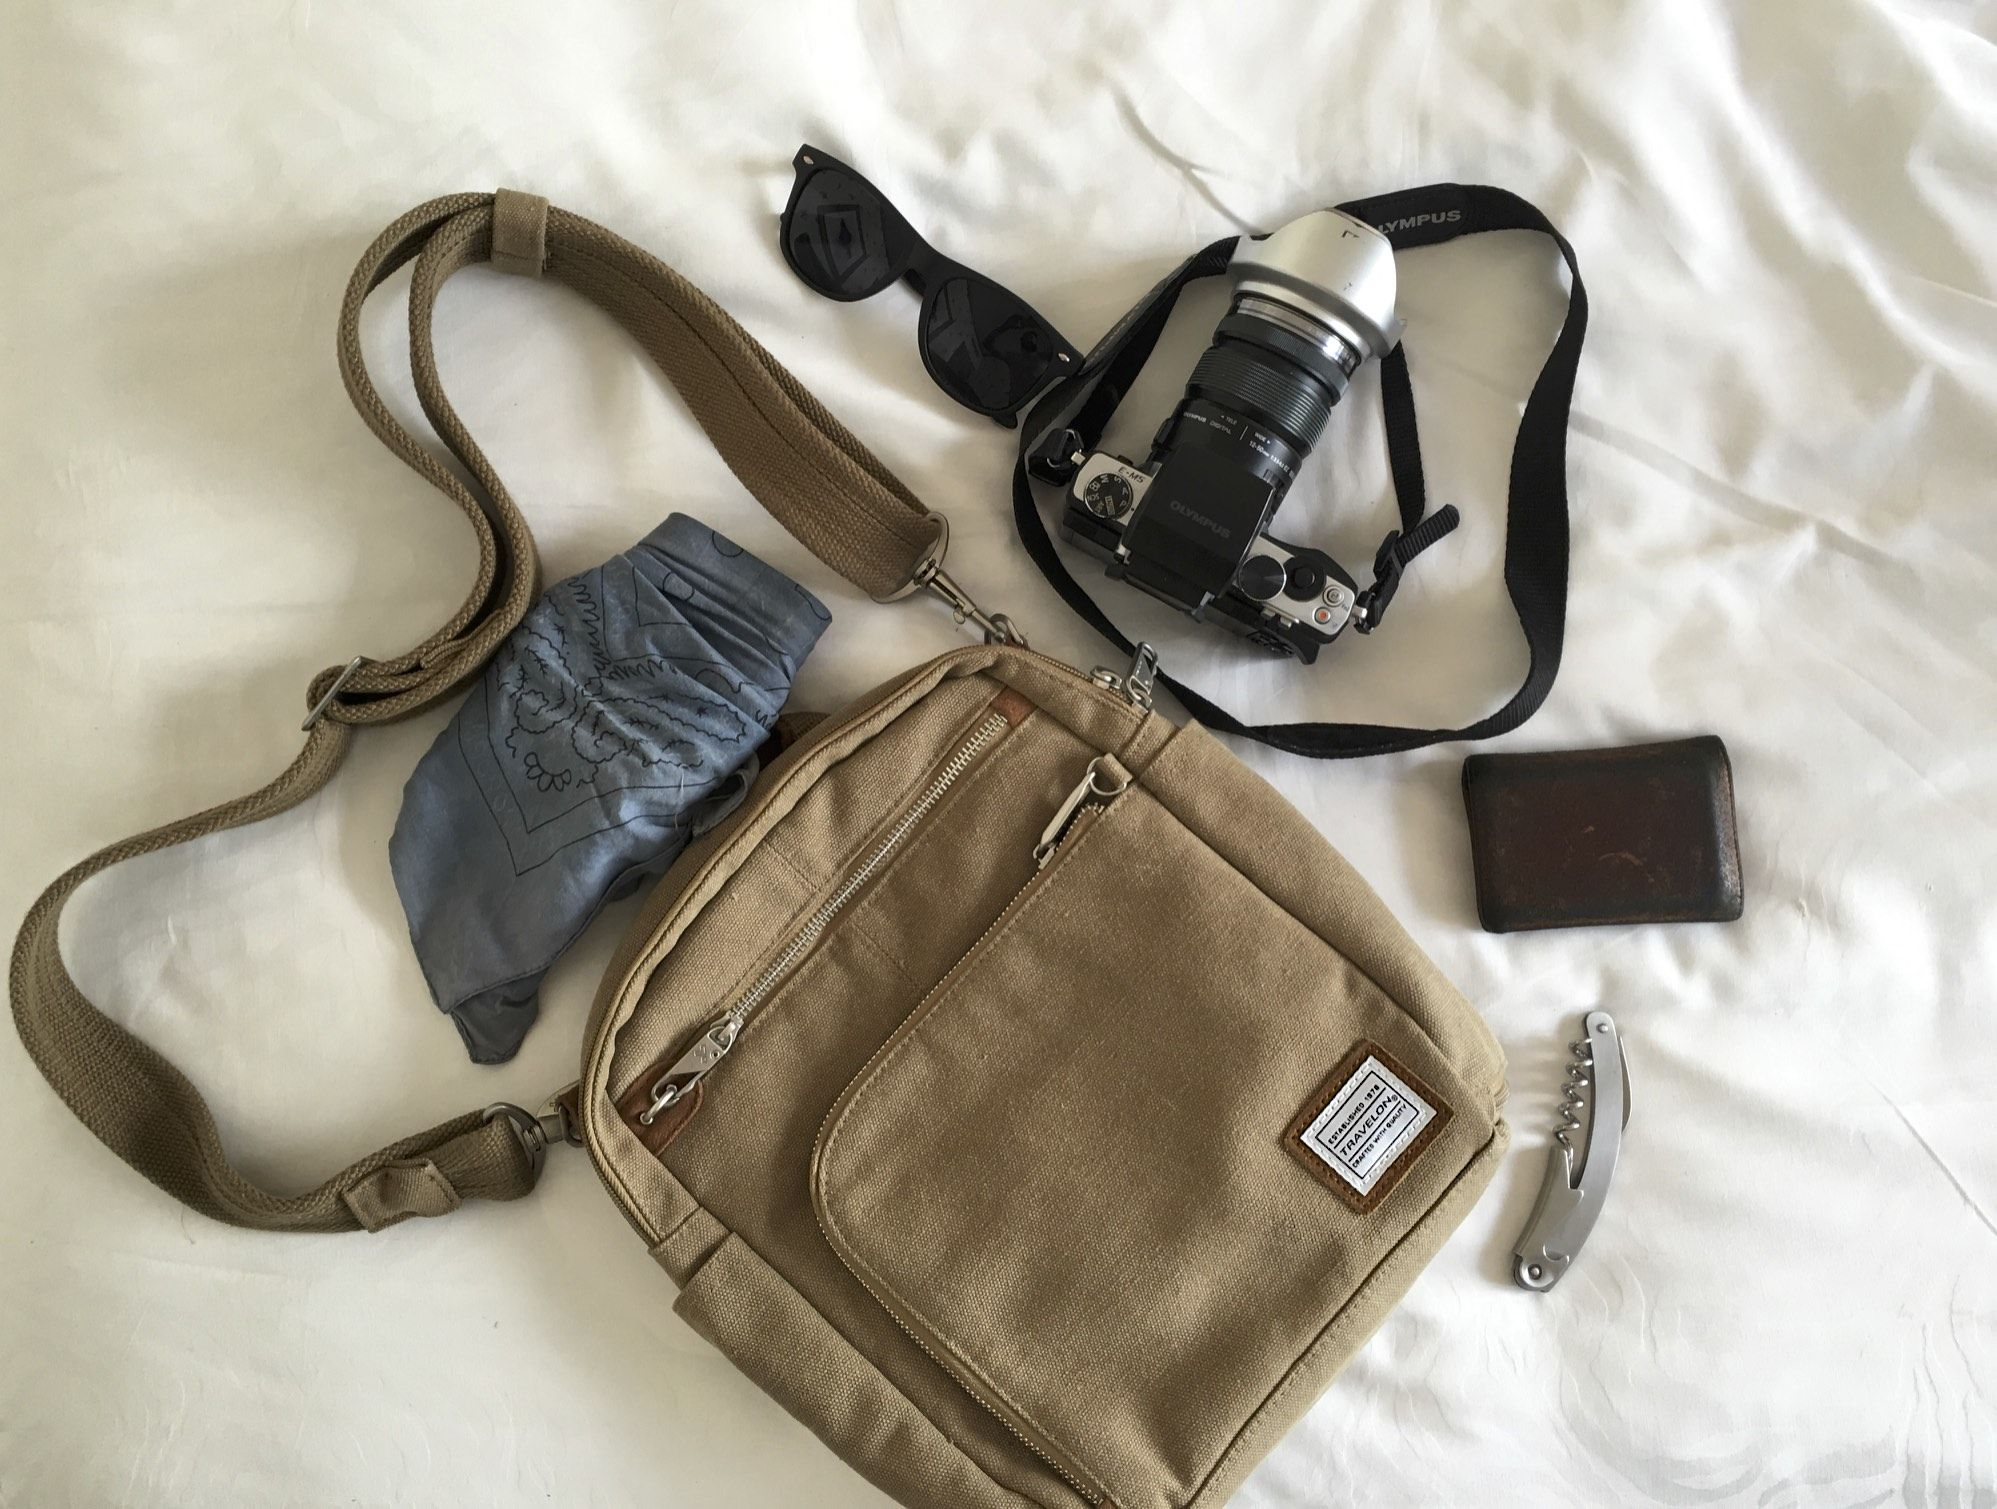 4ef9b2698e09 Travelon Anti-Theft Heritage Tour Bag #Travel #Giveaway Pin this ...